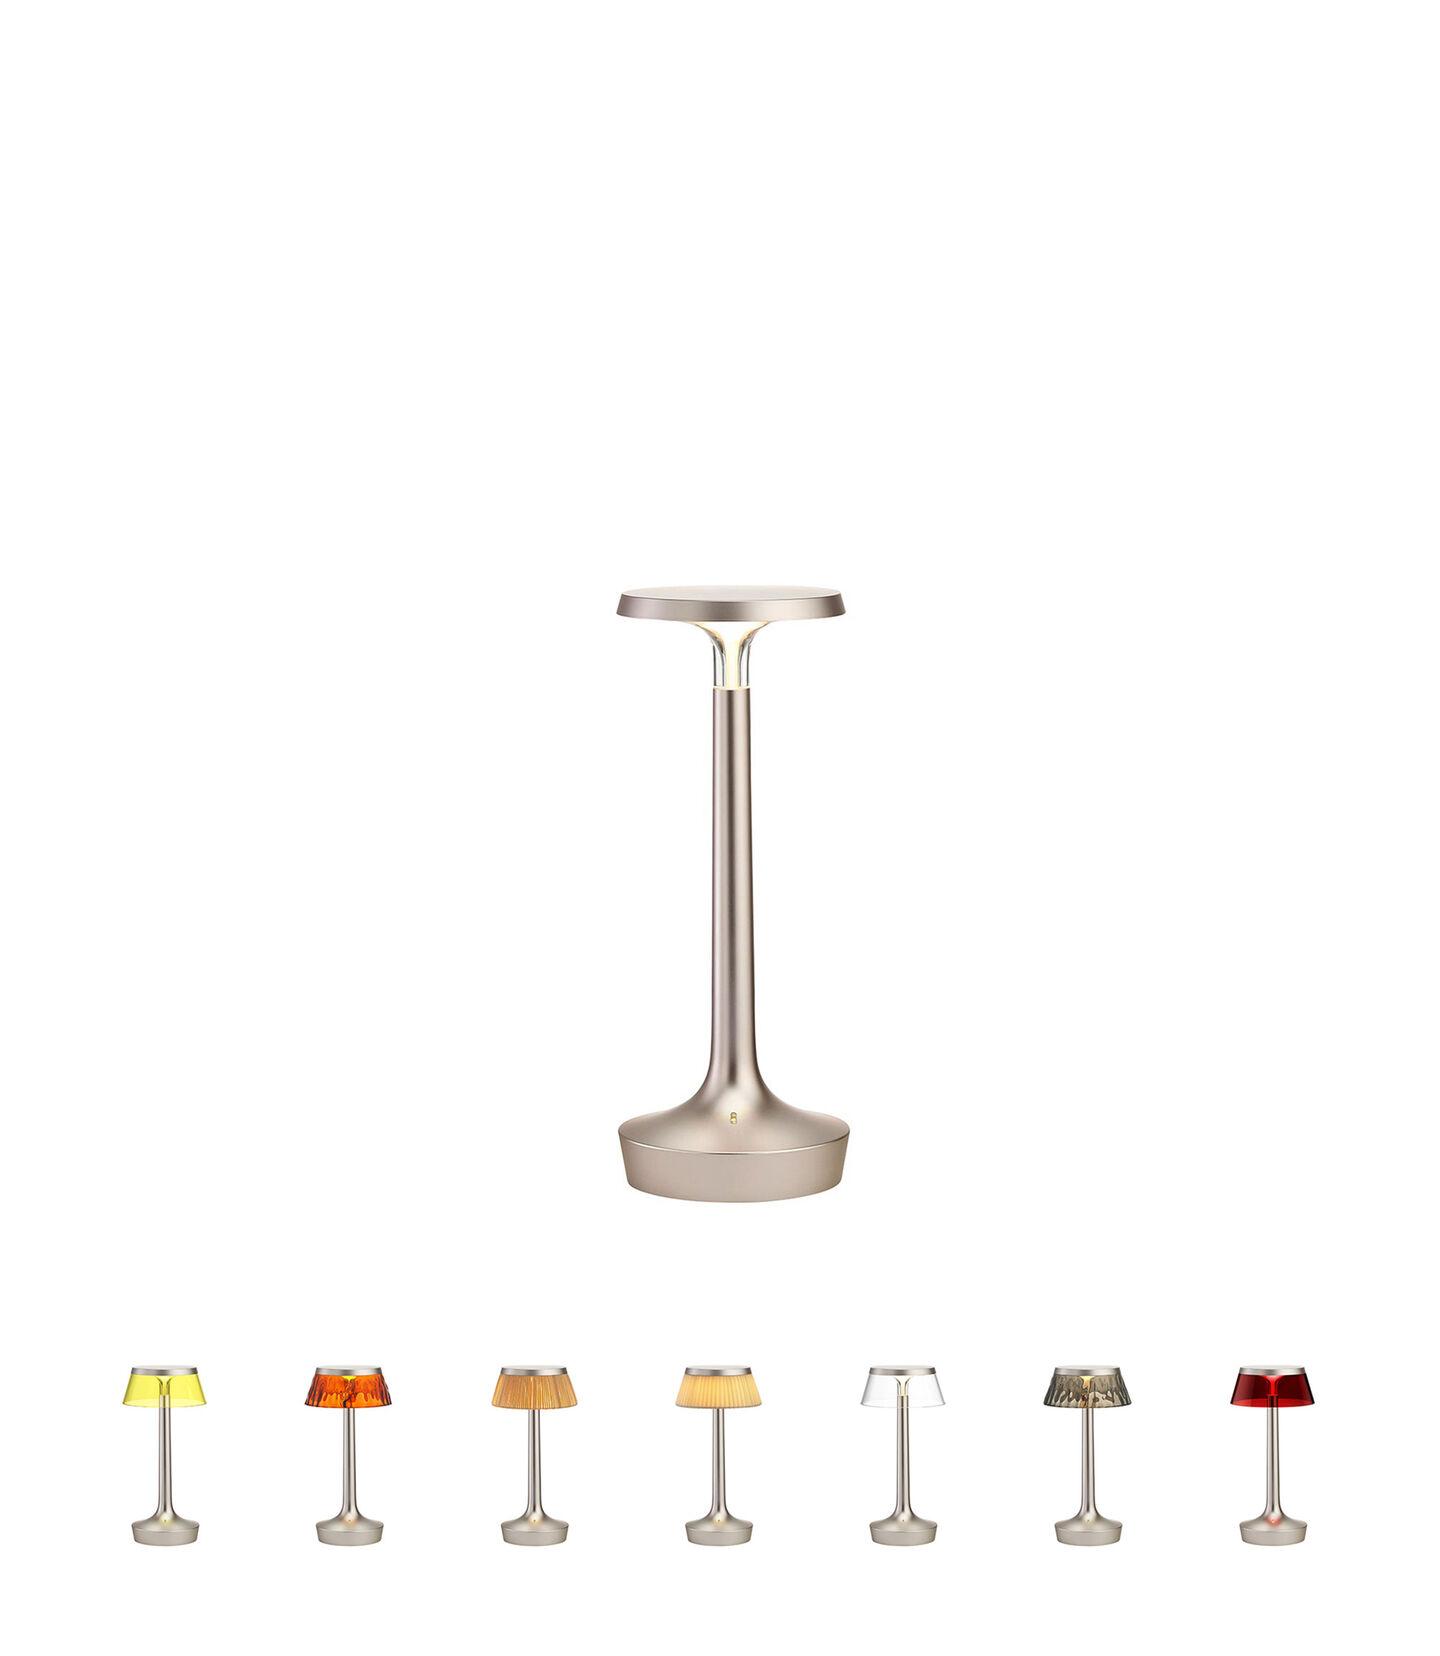 bon-jour-unplugged-table-starck-flos-F1037046-product-still-life-big